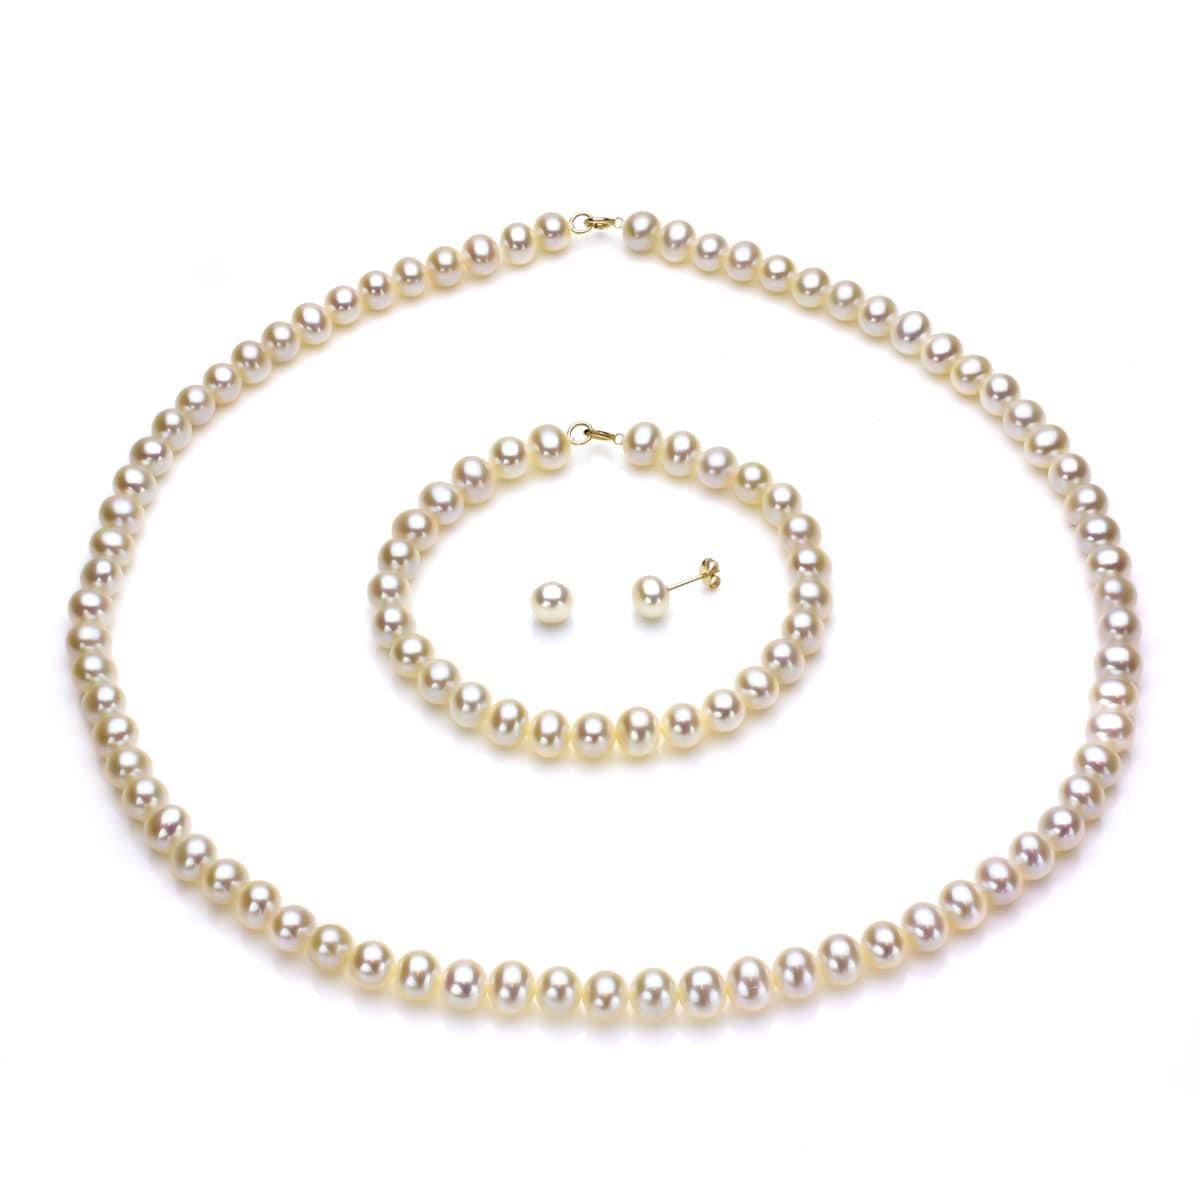 14K White-Pearl Necklace or Bracelet